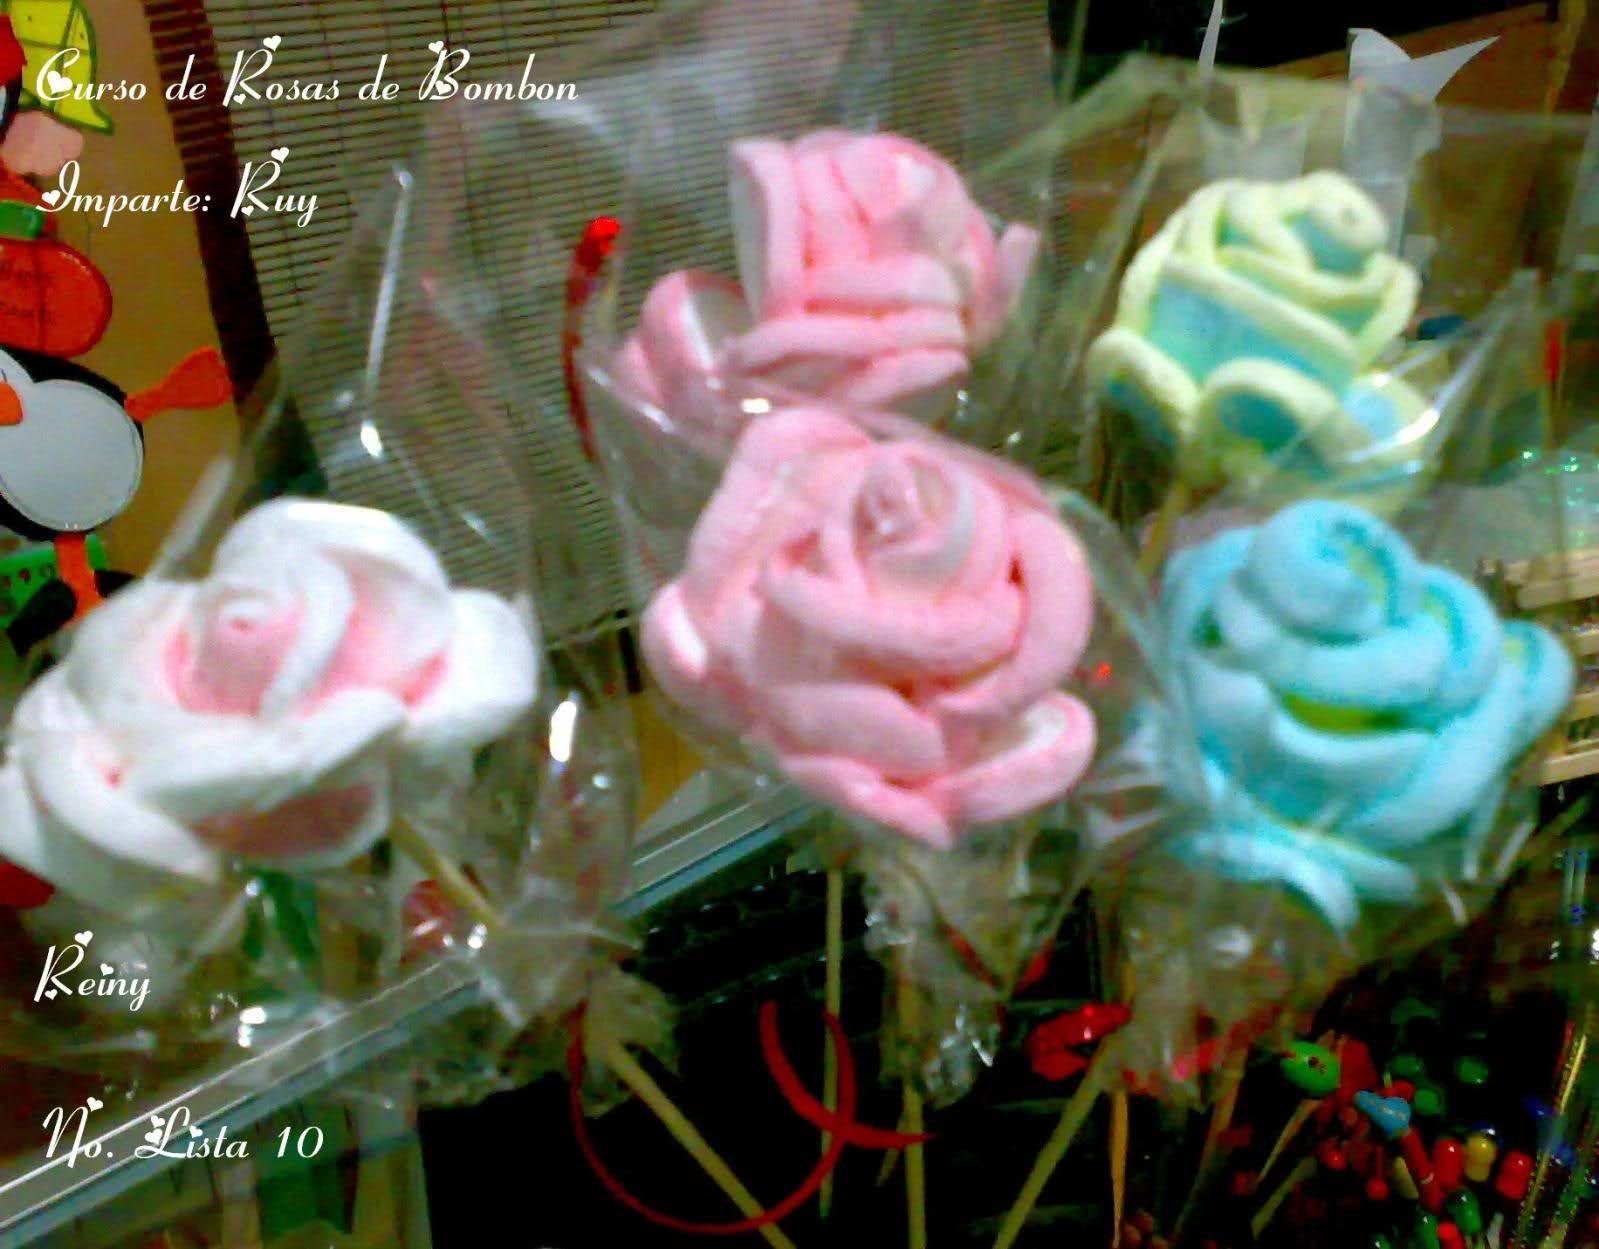 Como hacer rosas de bombon hawaii dermatology recetas - Flores para cocinar ...